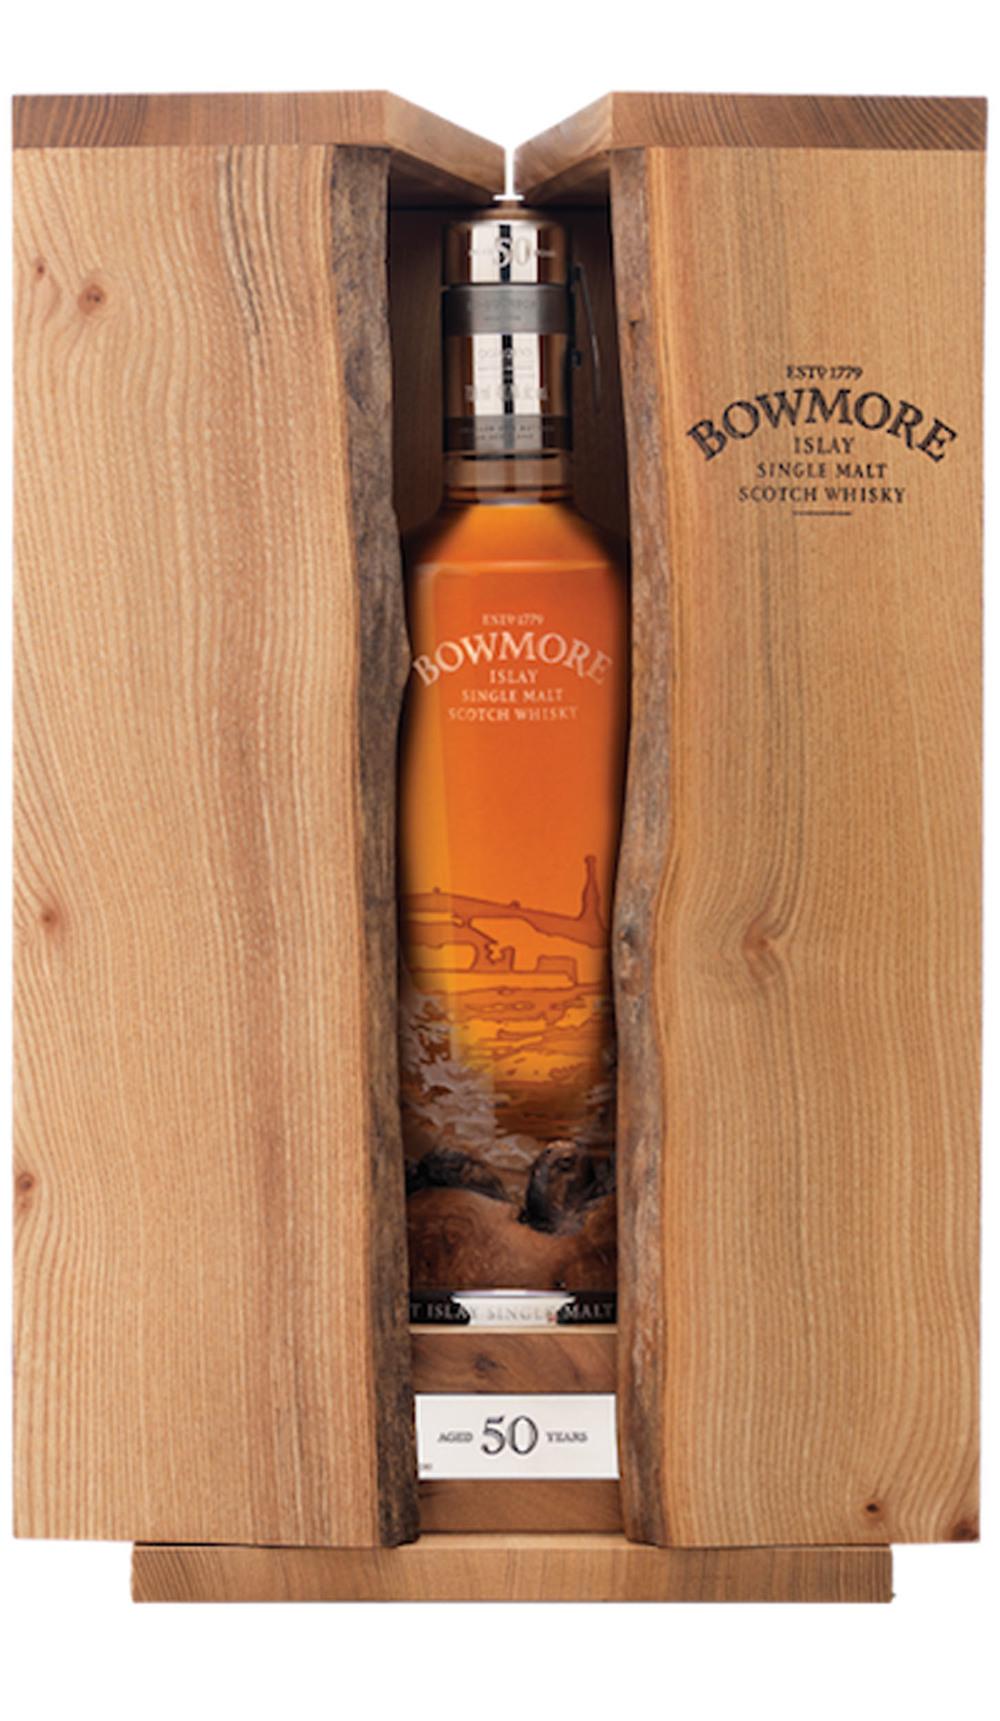 Bowmore-50yo.jpg